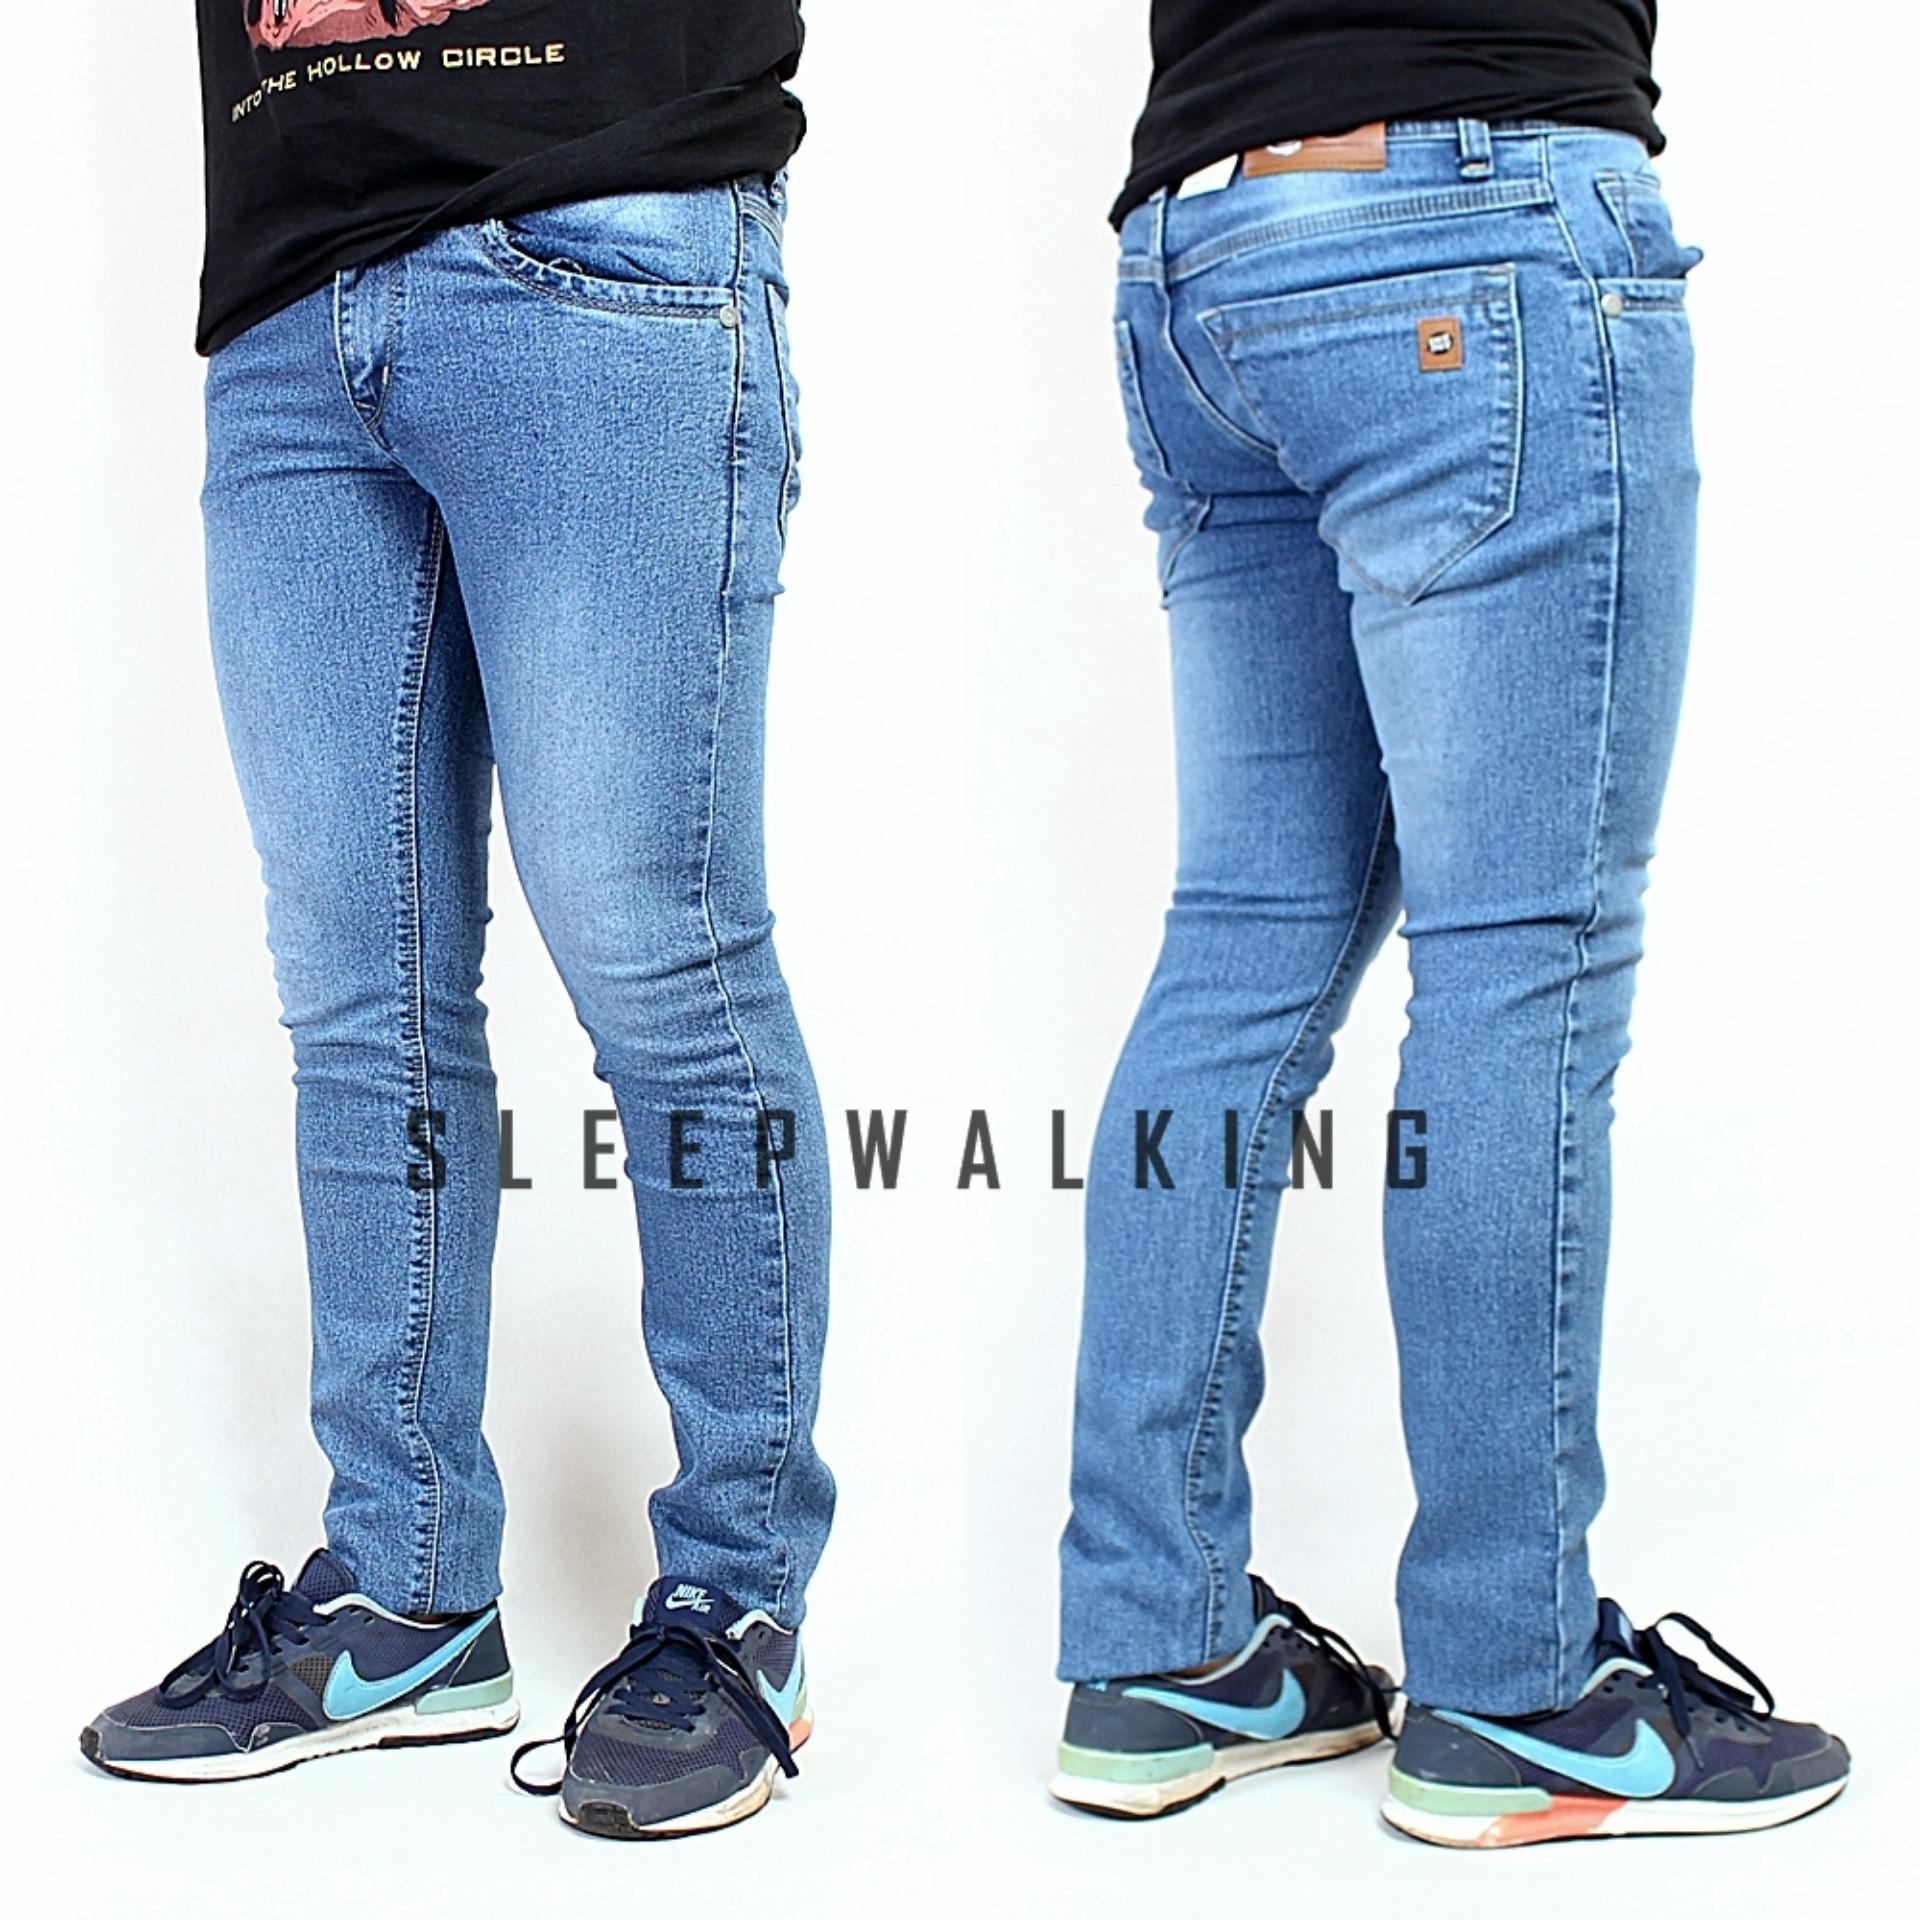 Cek Harga Baru Sw Jaket Jeans Hoodie Pria Bioblitz Black Terkini Denim Bioblits Celana Slimfit